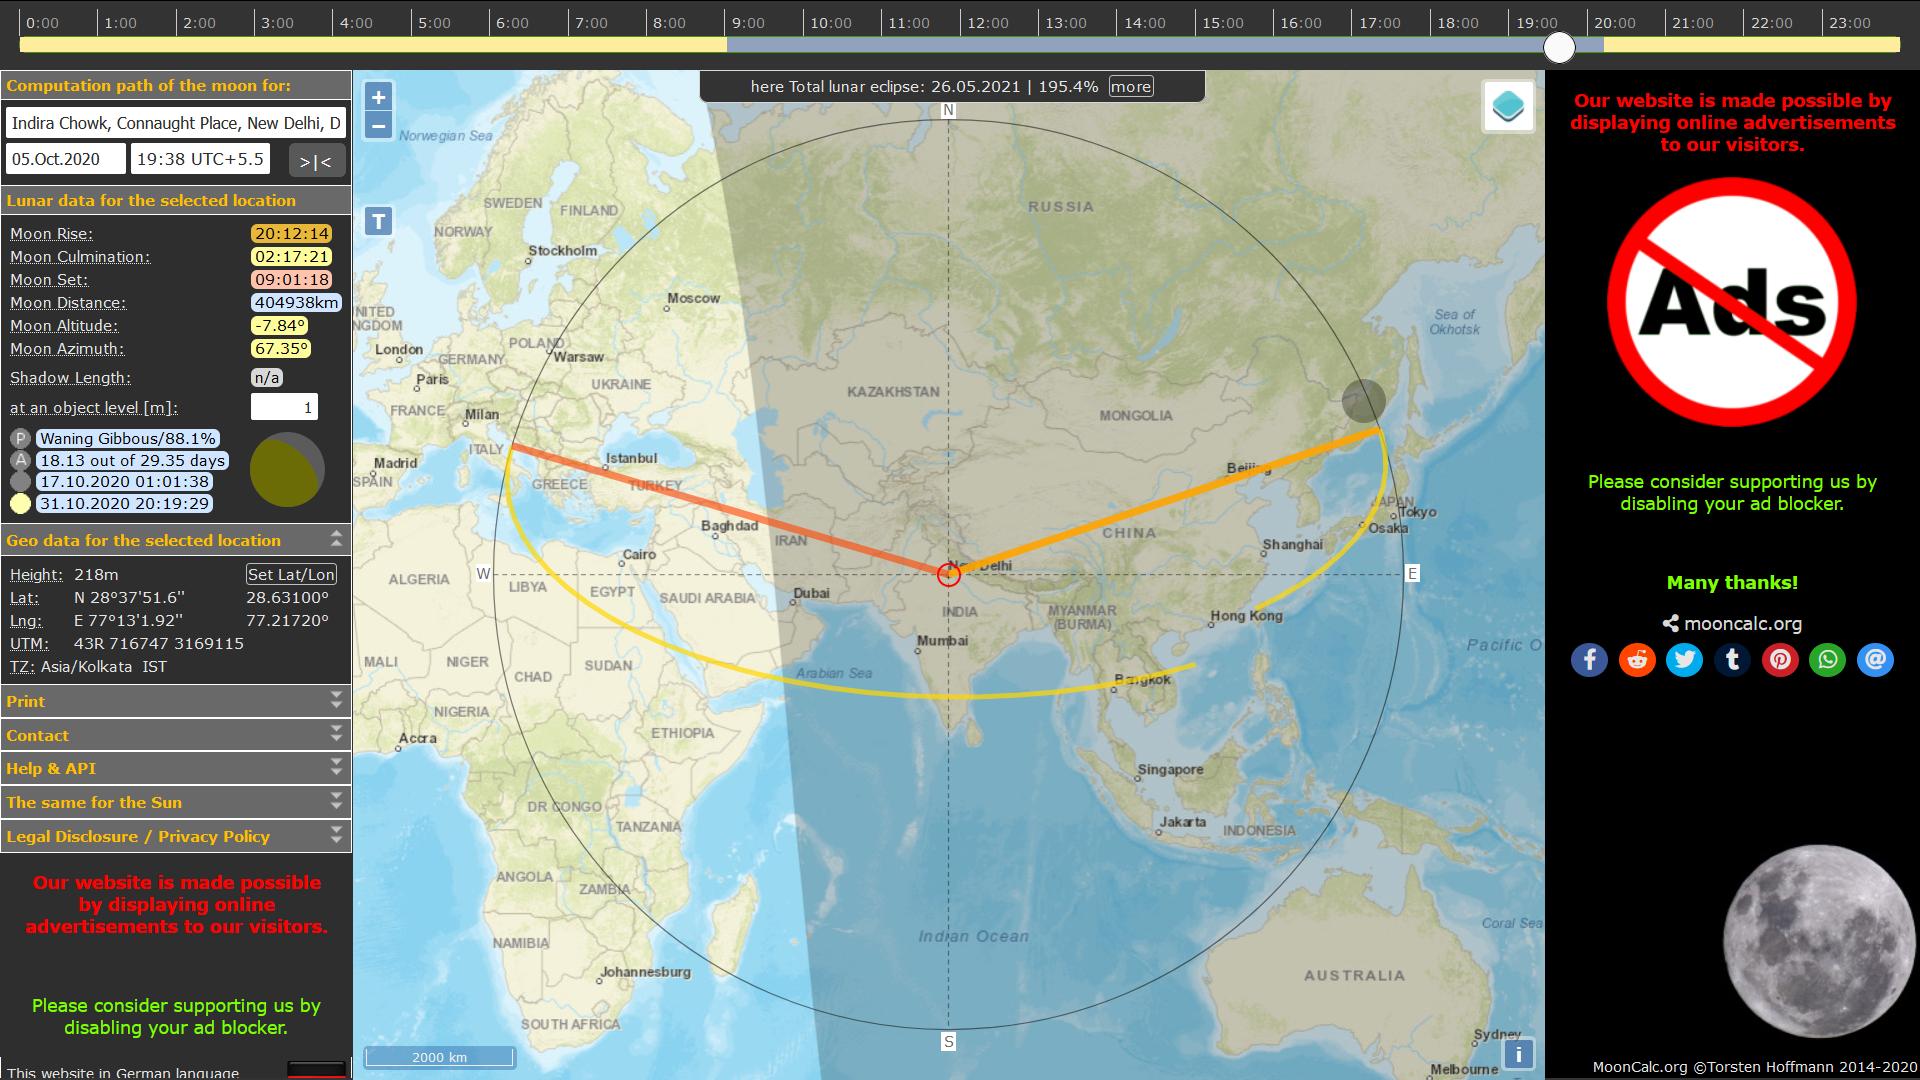 mooncalc-investigative-journalism-tool